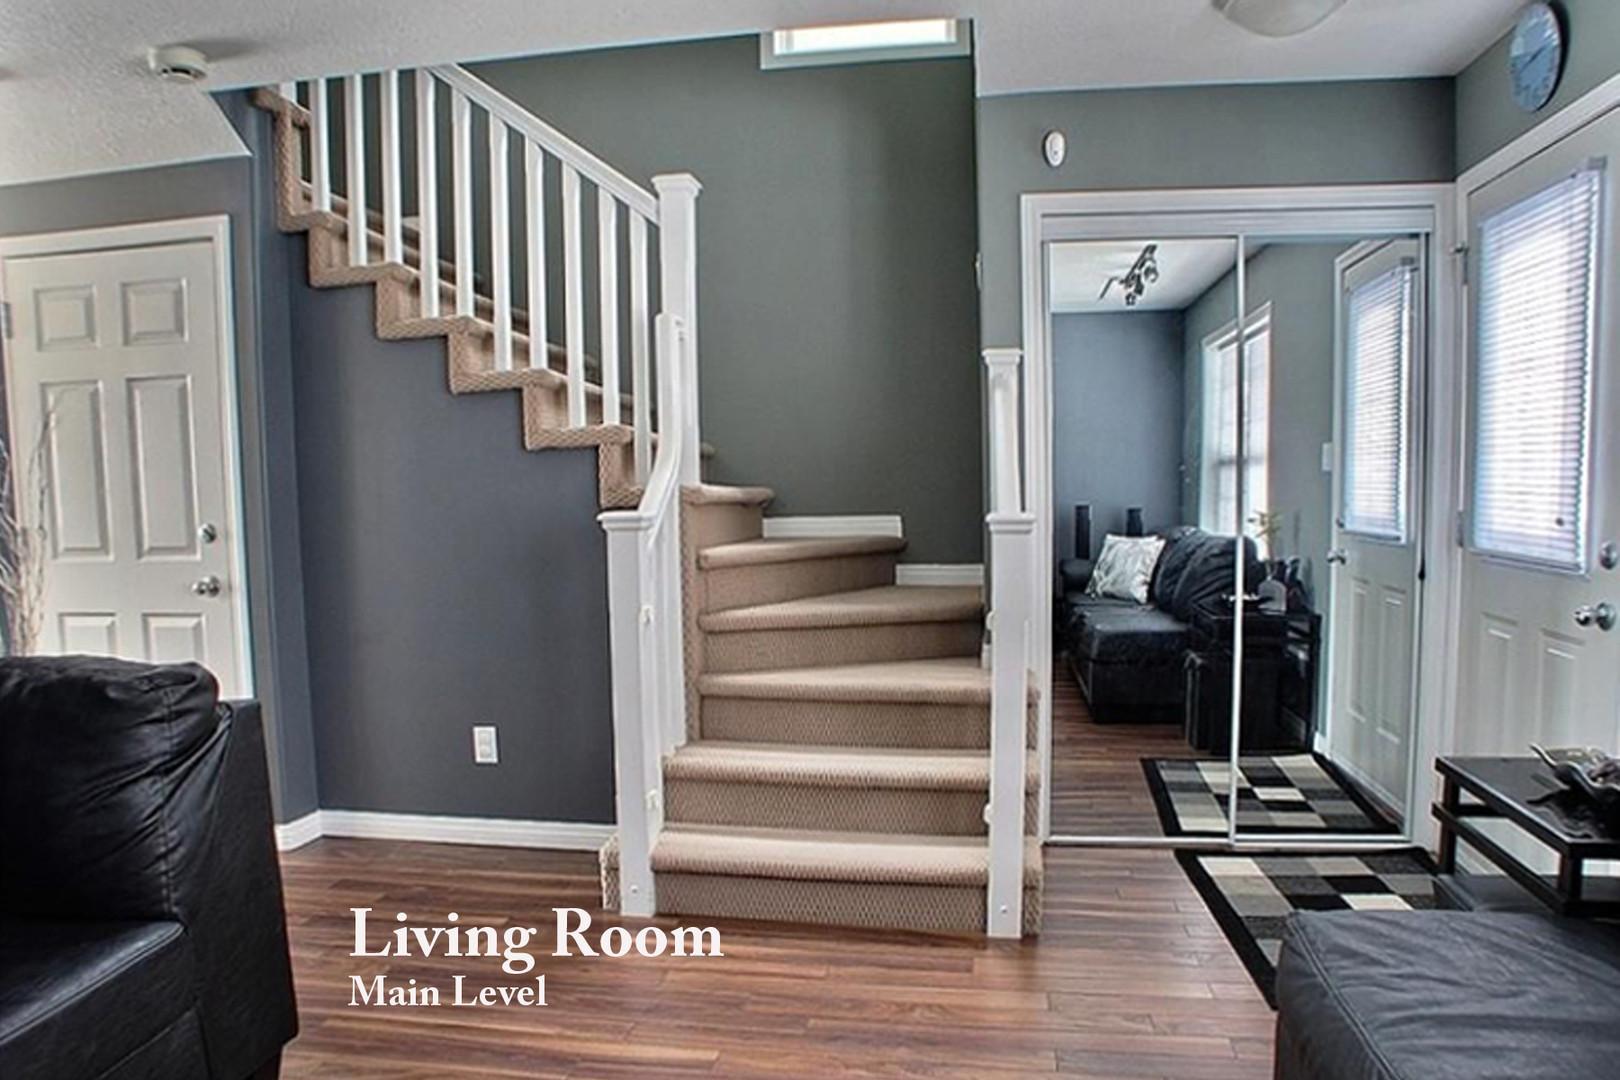 Living Room Main level 2.jfif